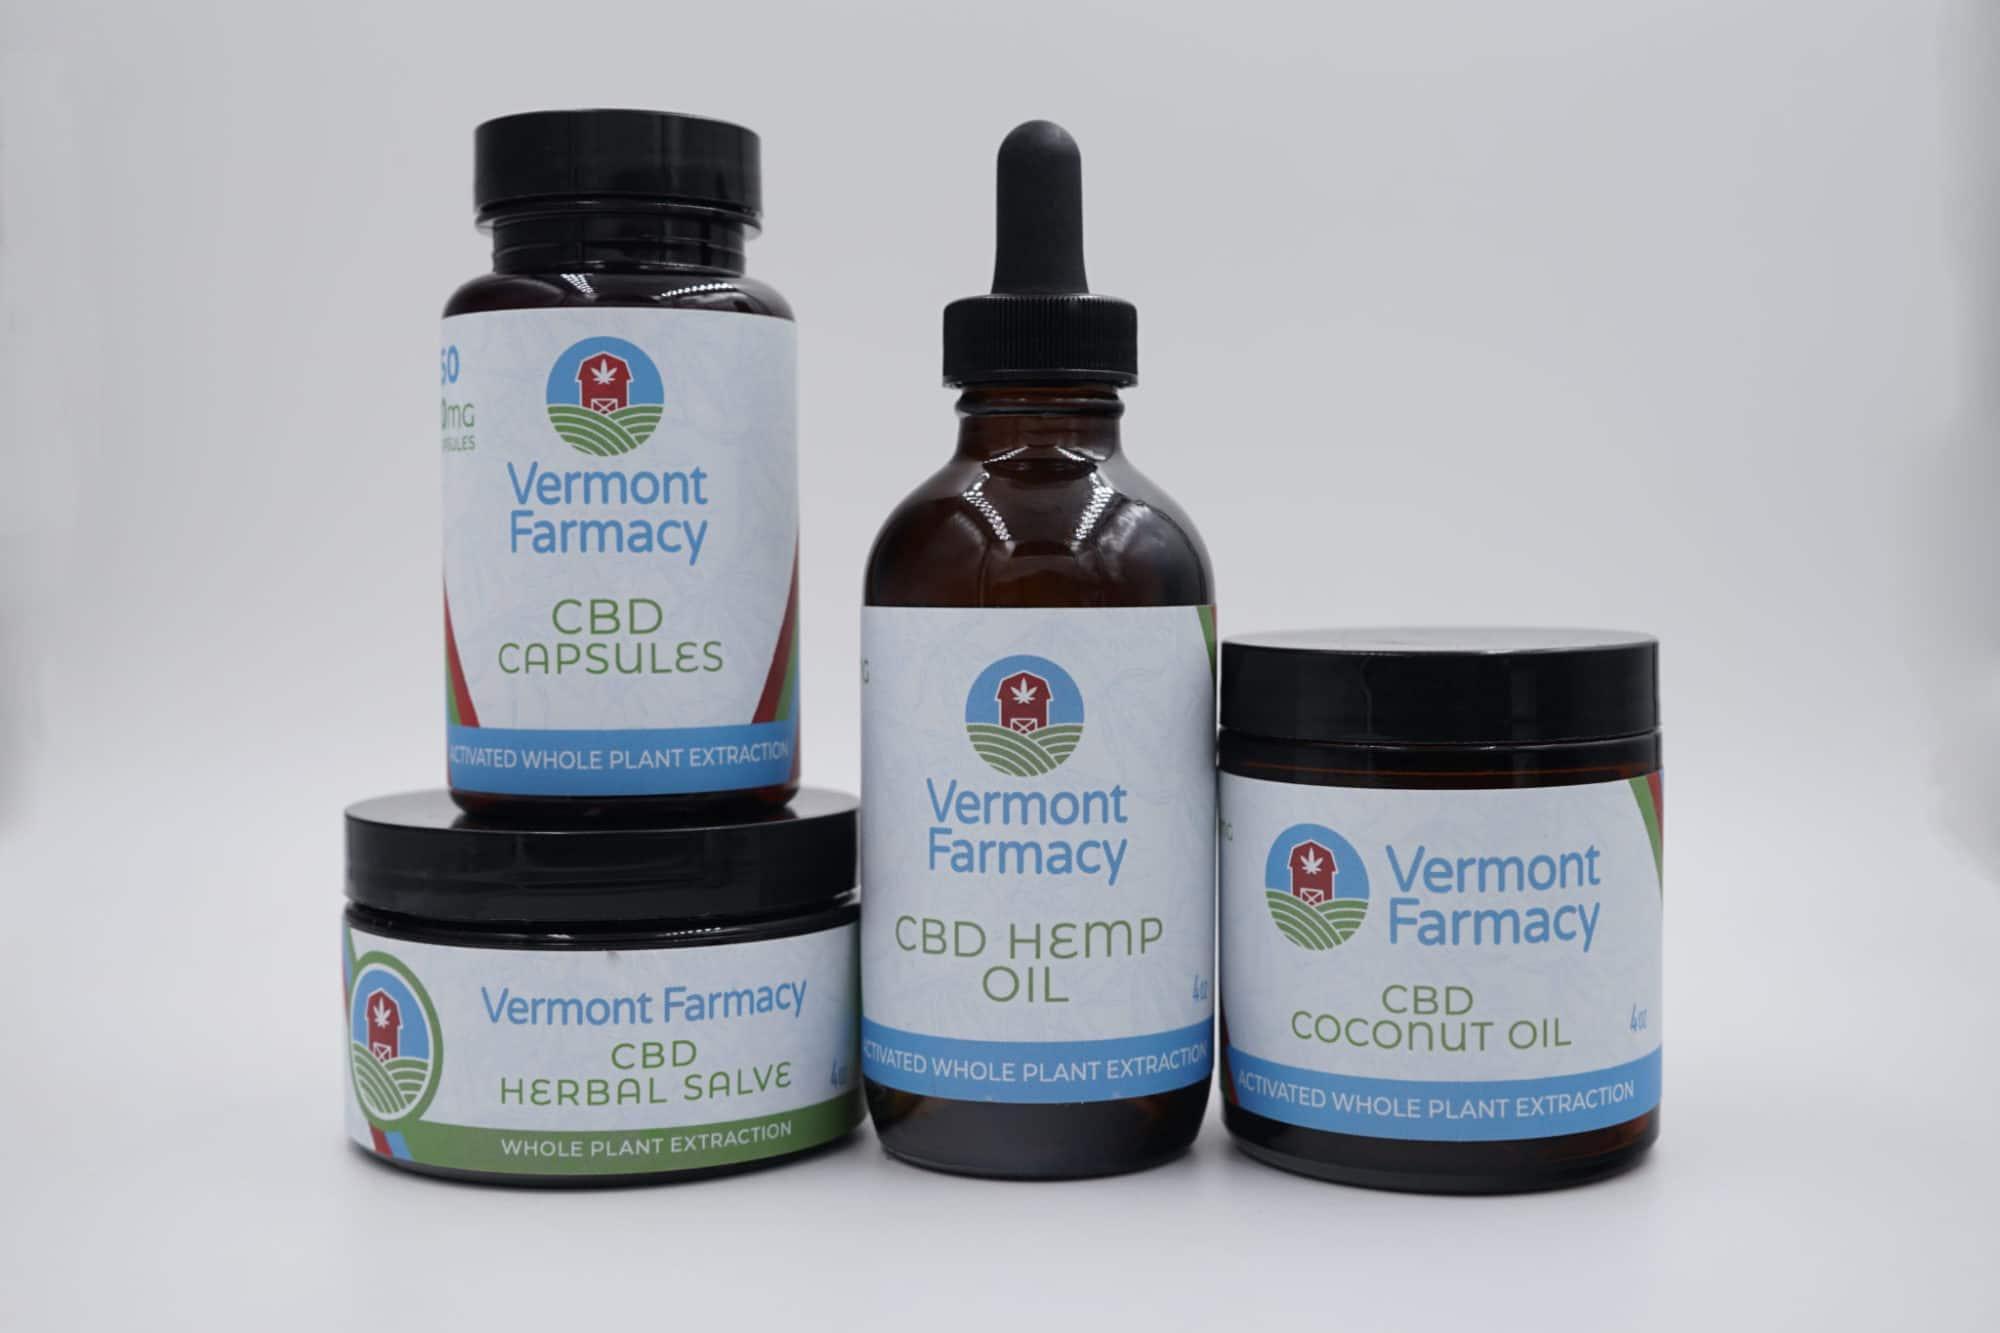 Vermont Farmacy products: CBD Capsules, CBD Herbal Salve, CBD Hemp Oil, and CBD Coconut Oil